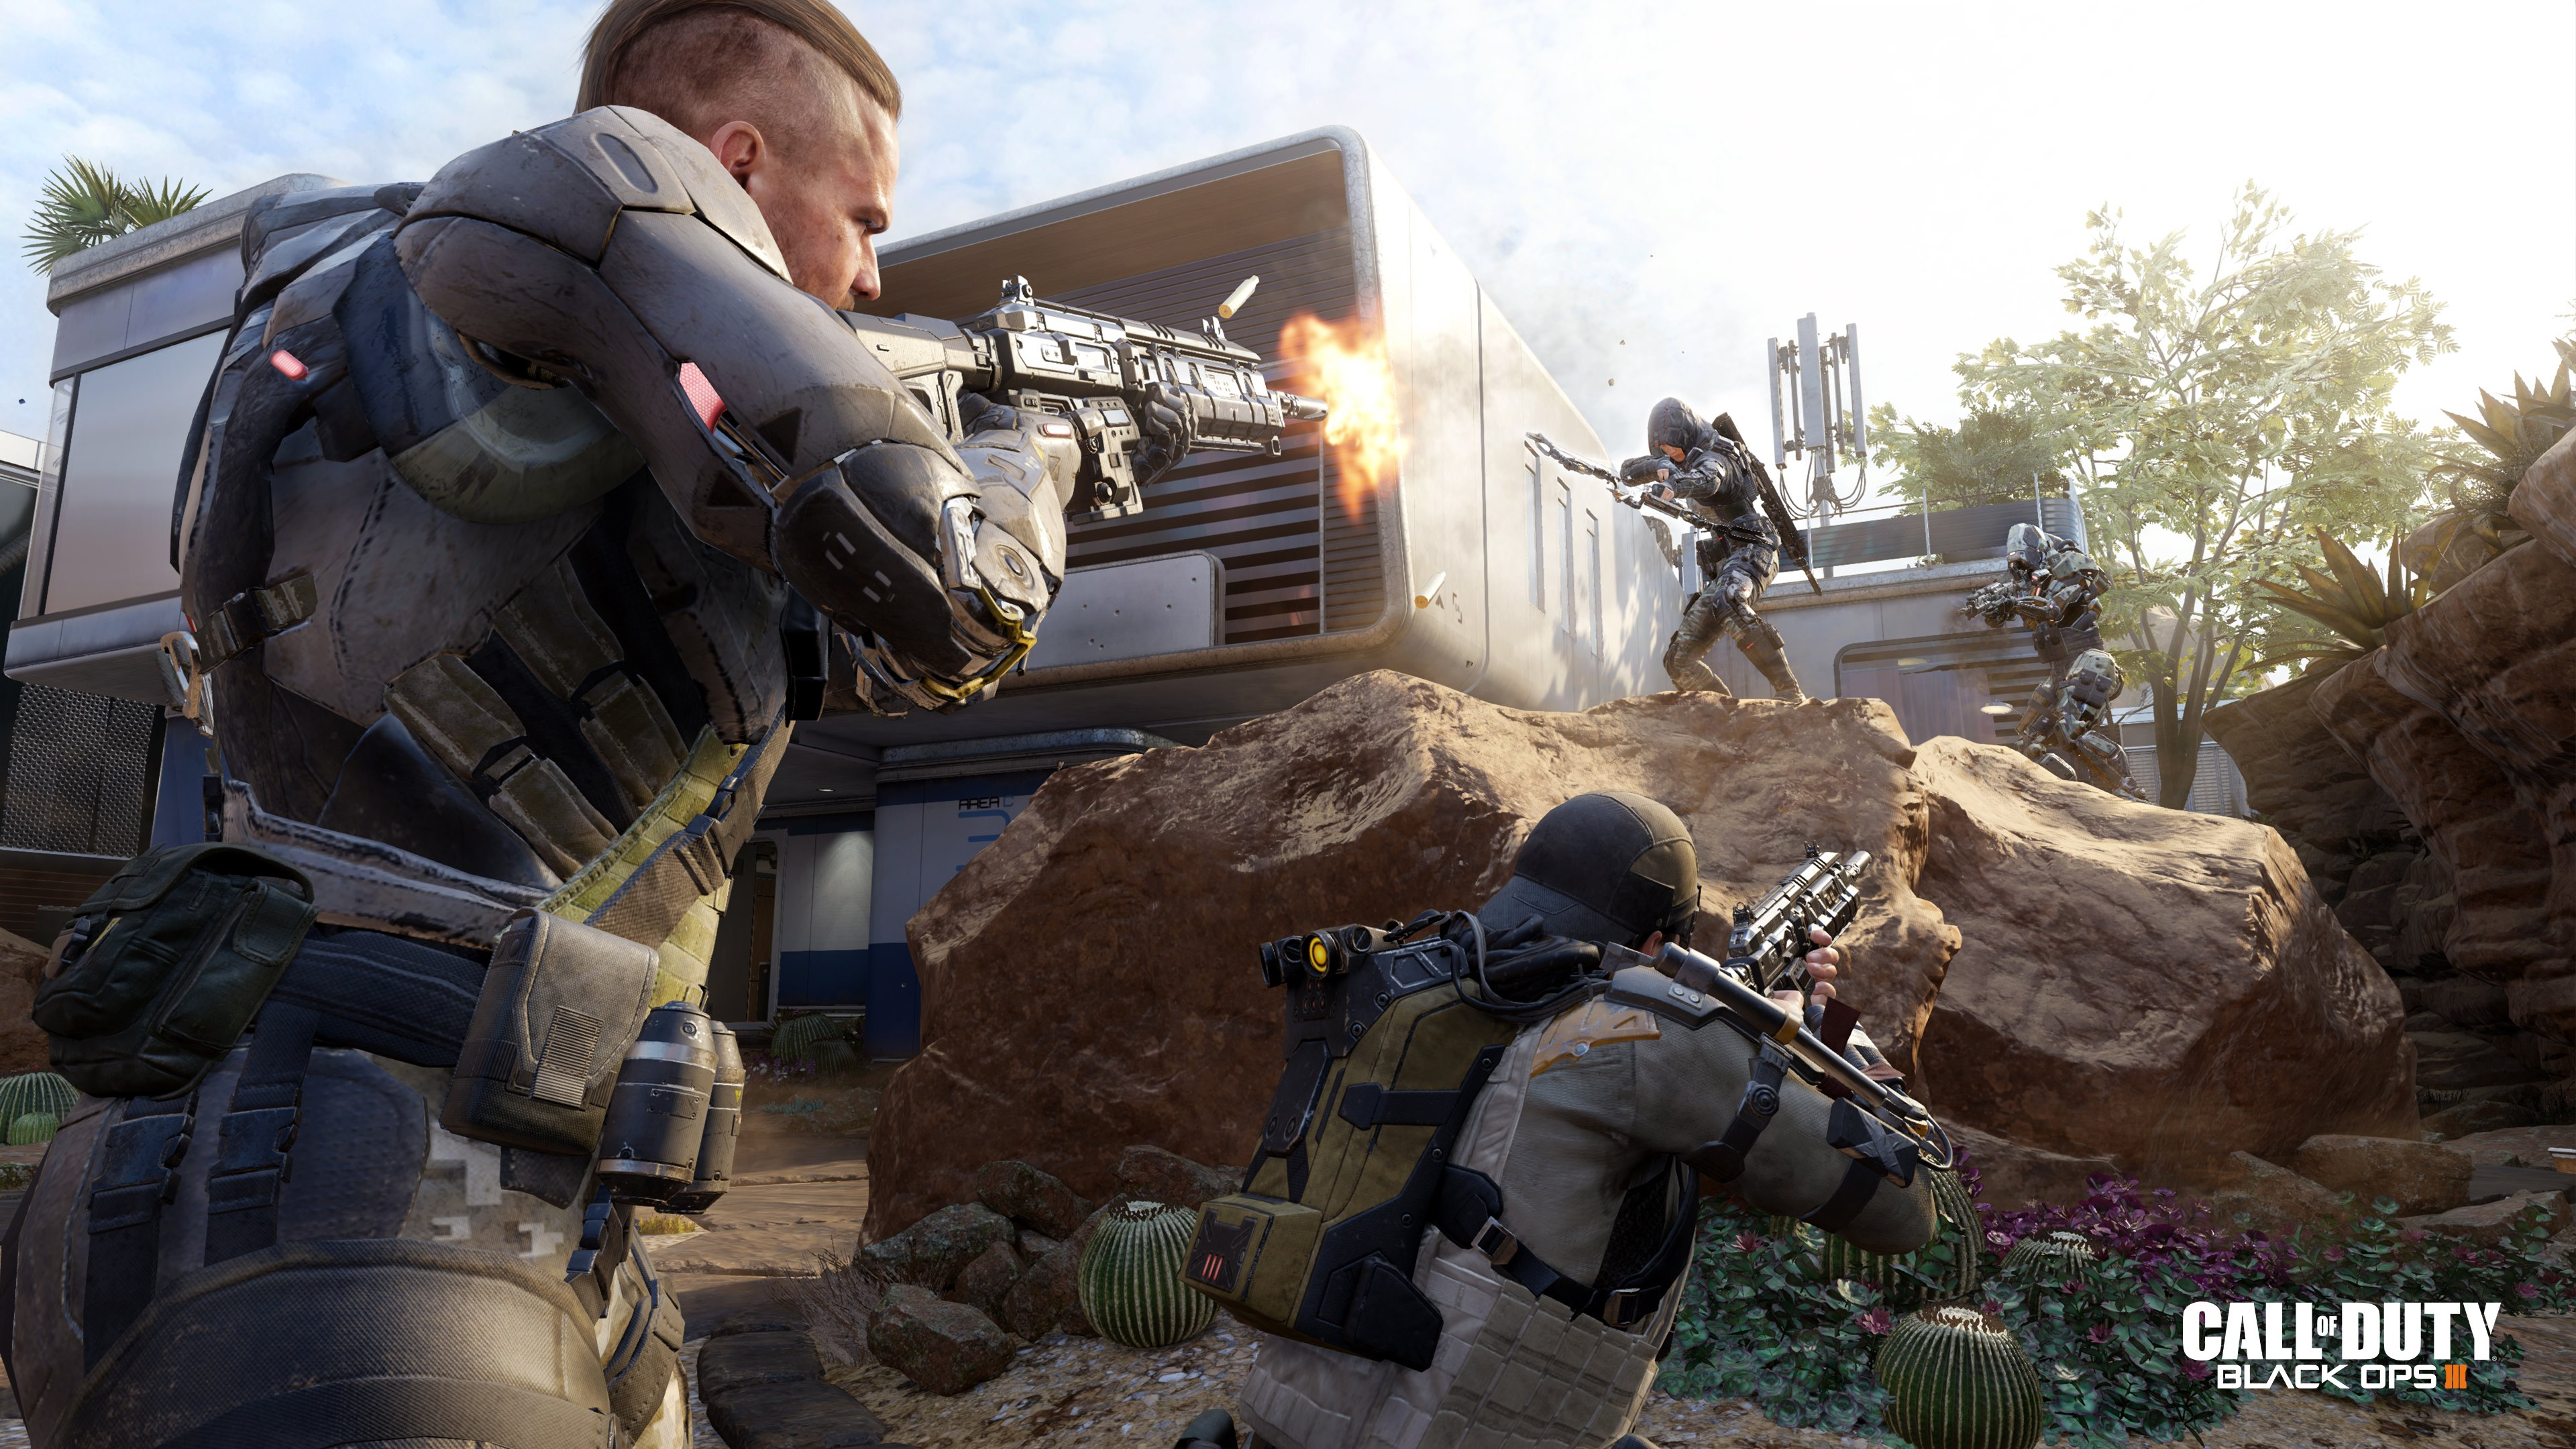 Call of Duty Black Ops III 2015 HD Wallpapers 4K Wallpapers 3840x2160